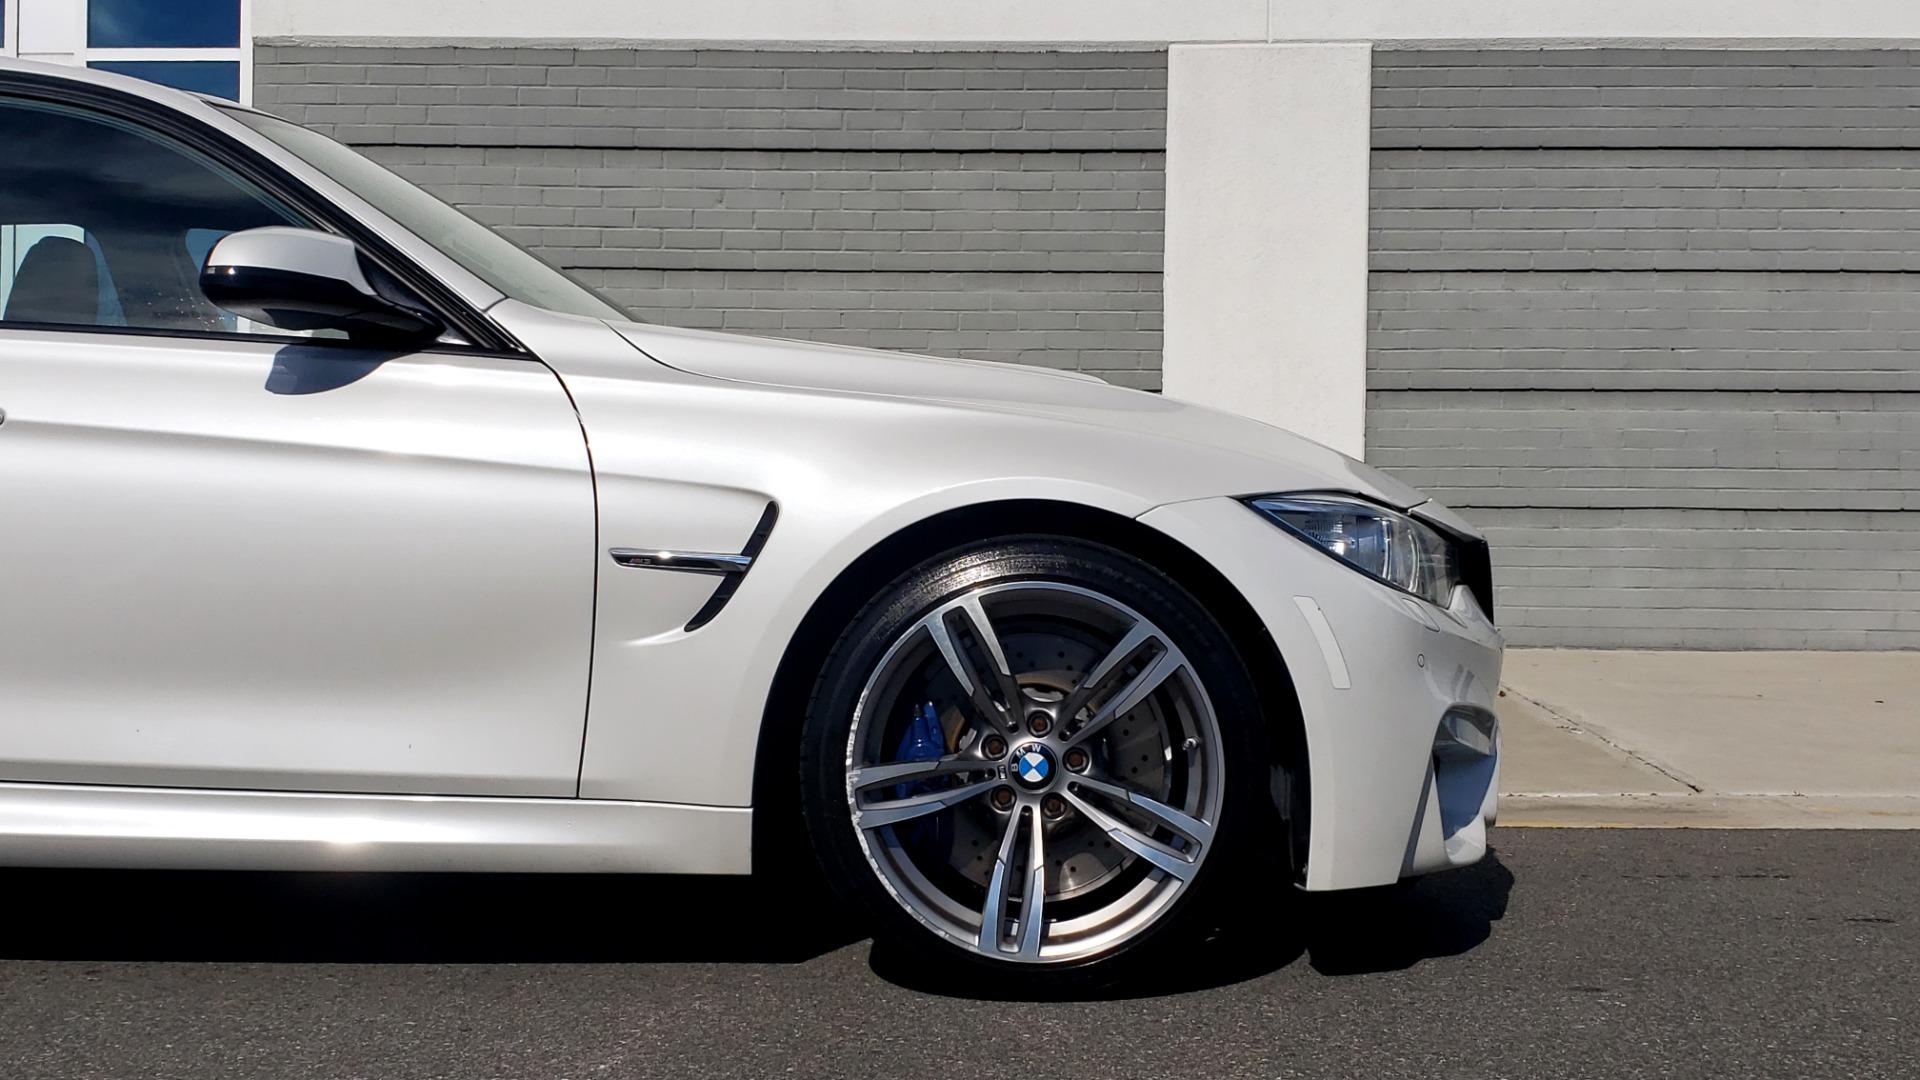 Used 2016 BMW M3 SEDAN / EXECUTIVE PKG / M-SUSPENSION / HARMAN/KARDON SOUND for sale Sold at Formula Imports in Charlotte NC 28227 81